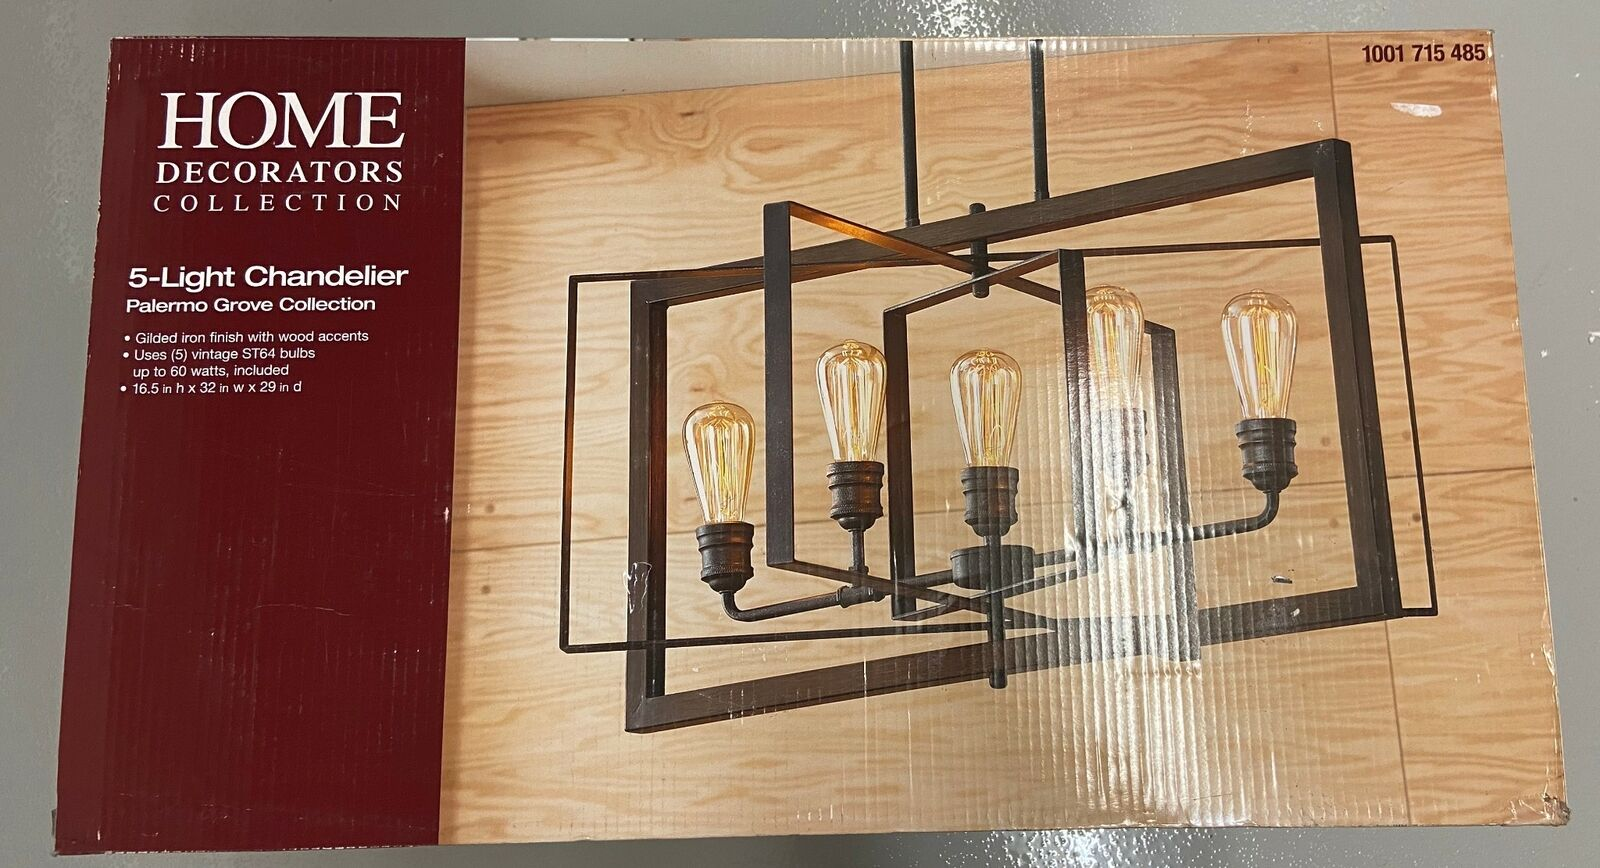 Home Decorators Collection 1001715485 Palermo Grove 5 Chandelier 1136066 C0376 For Sale Online Ebay